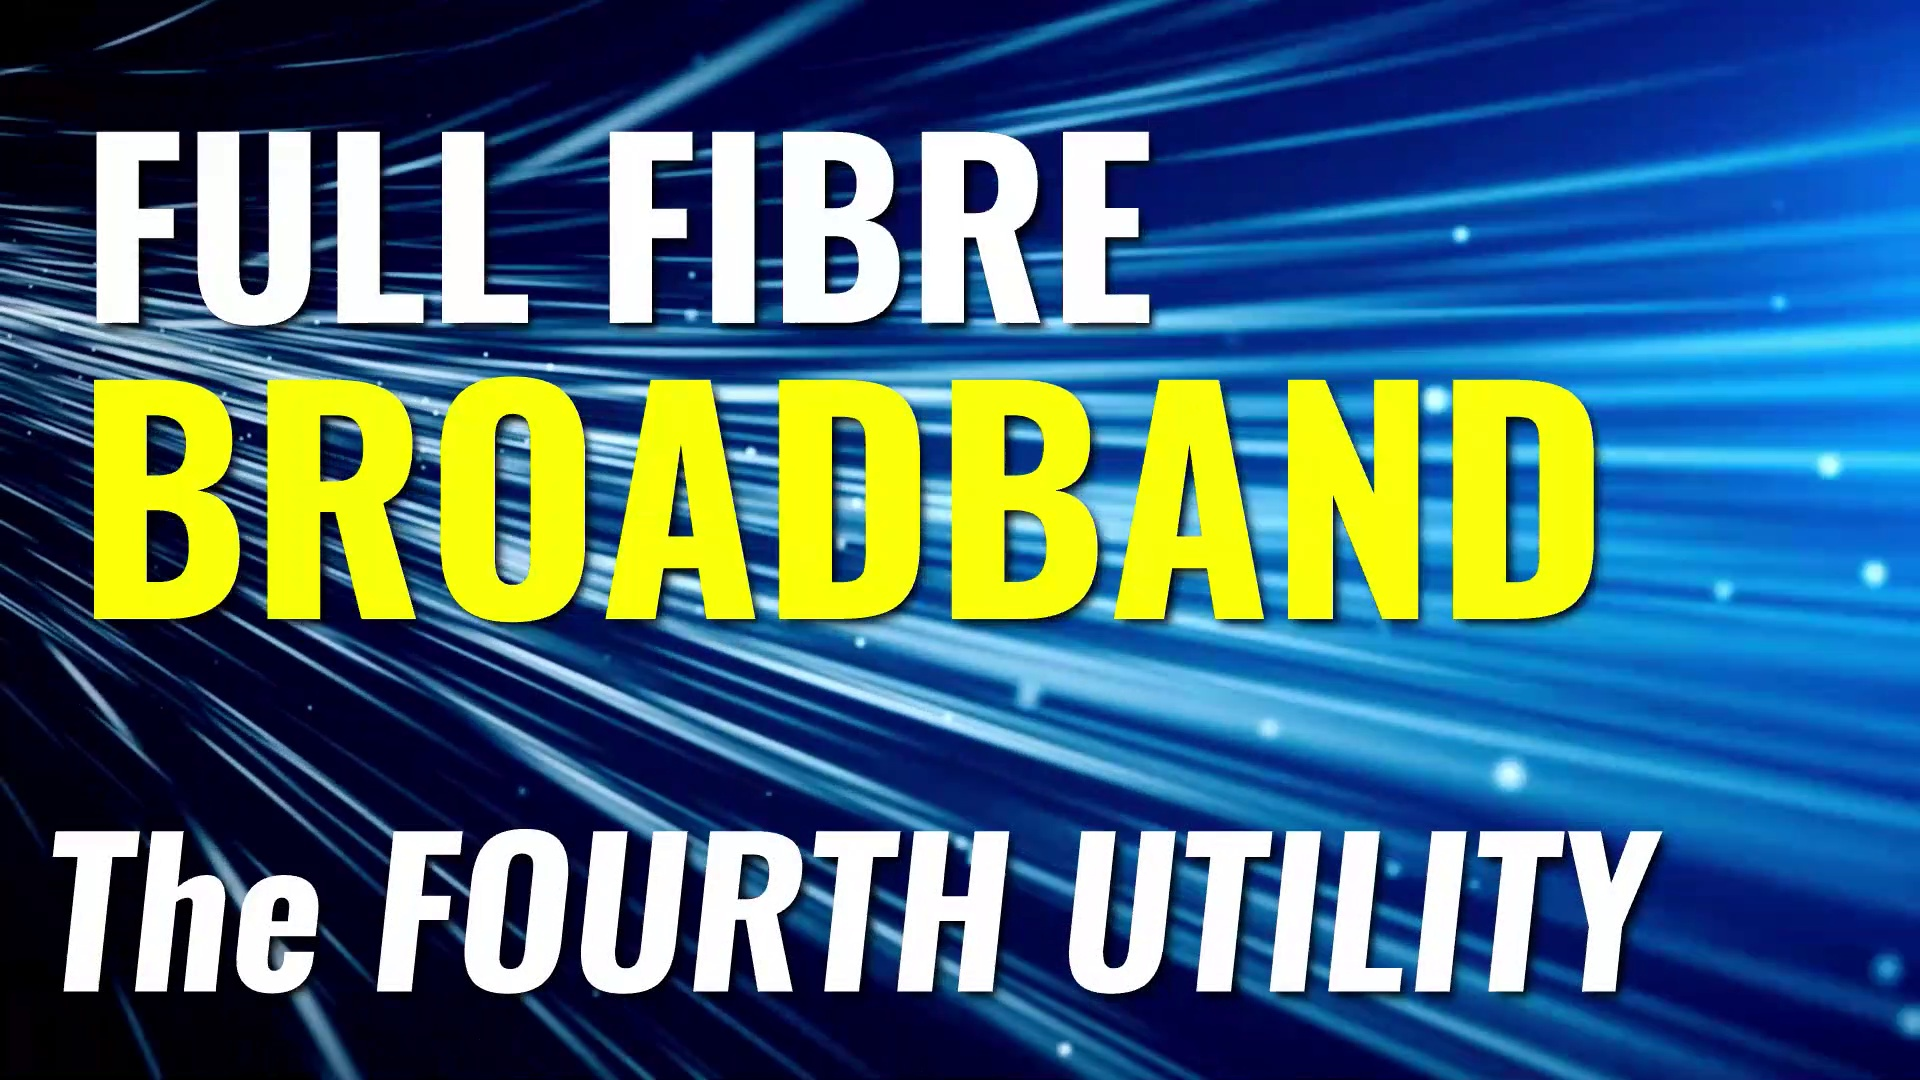 Full fibre broadband